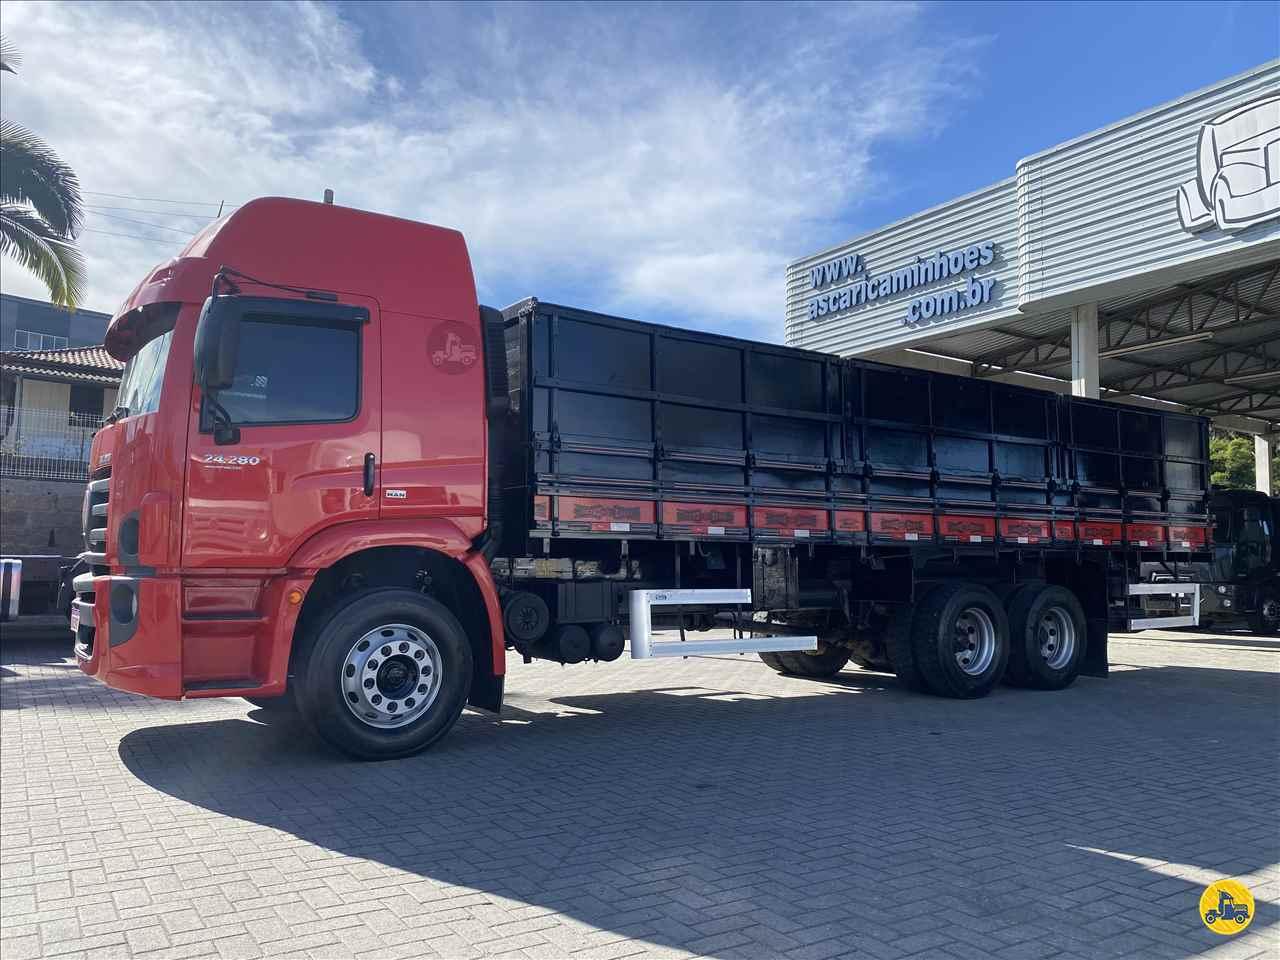 CAMINHAO VOLKSWAGEN VW 24280 Graneleiro Truck 6x2 Ascari Caminhões ORLEANS SANTA CATARINA SC